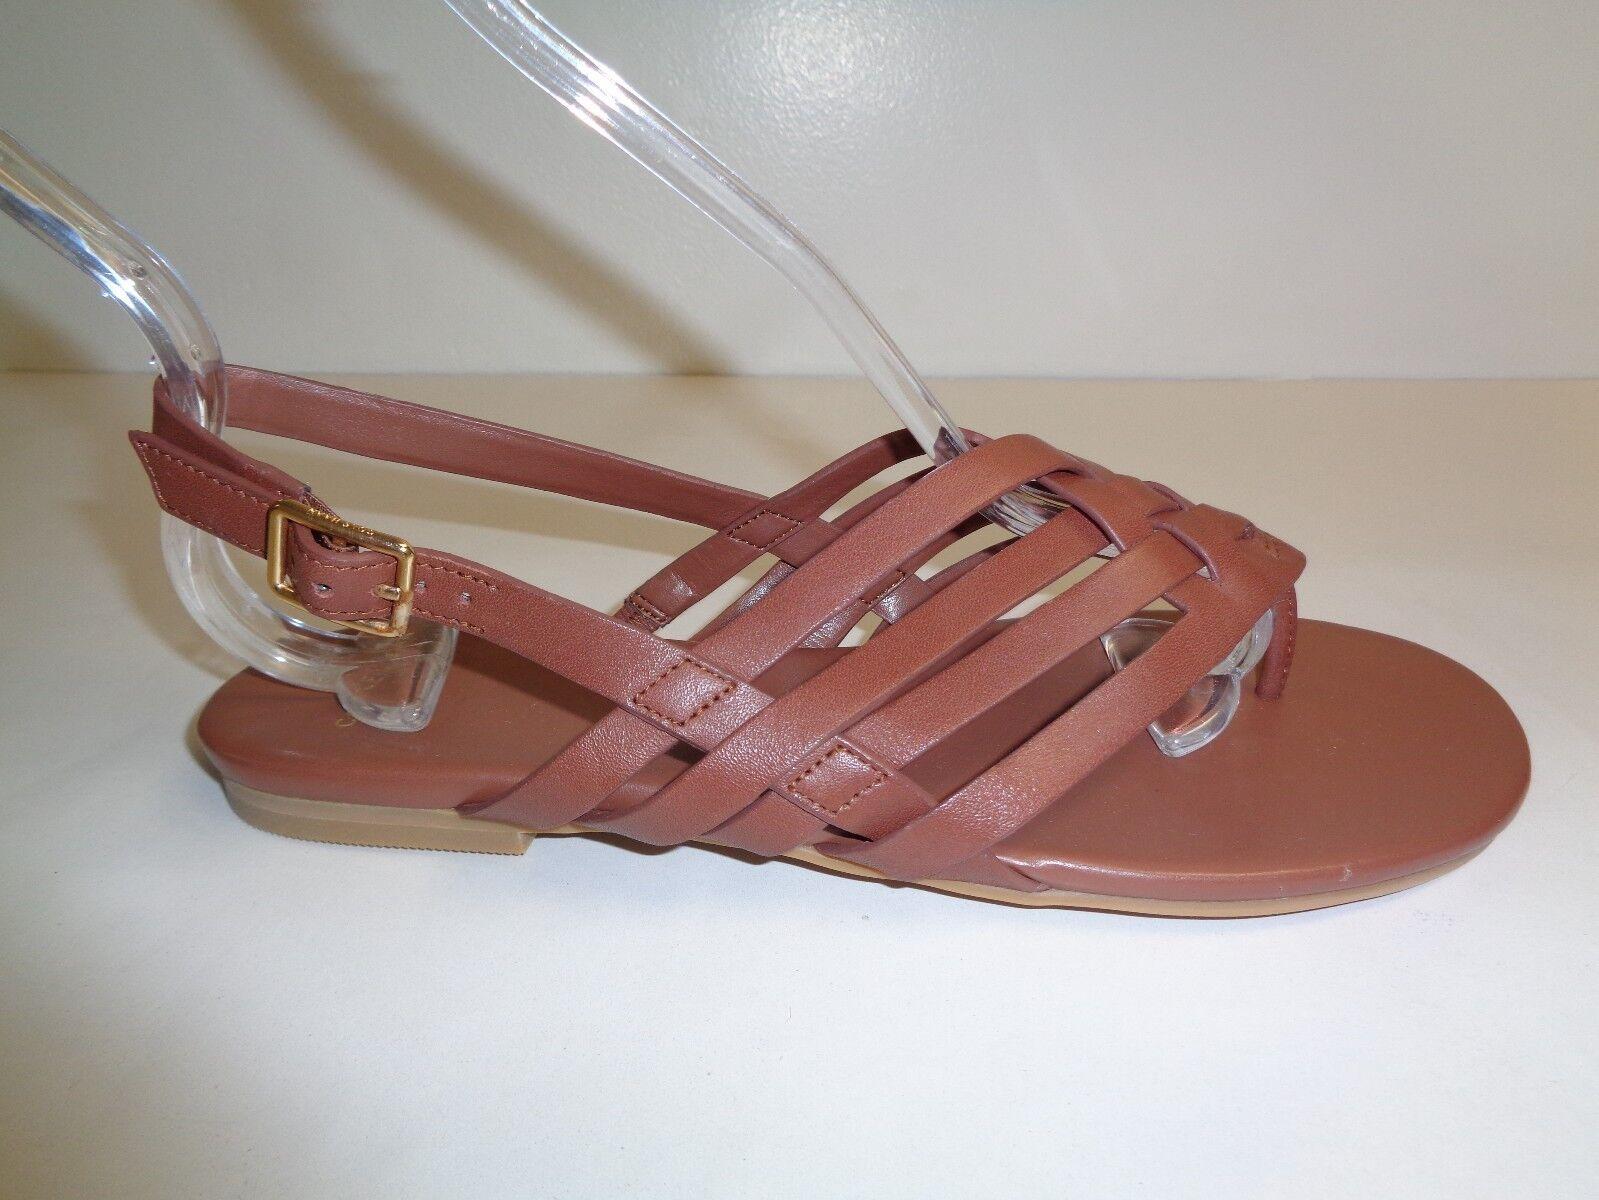 Cole Haan Größe 6 M GODDARD SANDAL Braun Leder Thongs Sandales NEU Damenschuhe Schuhes